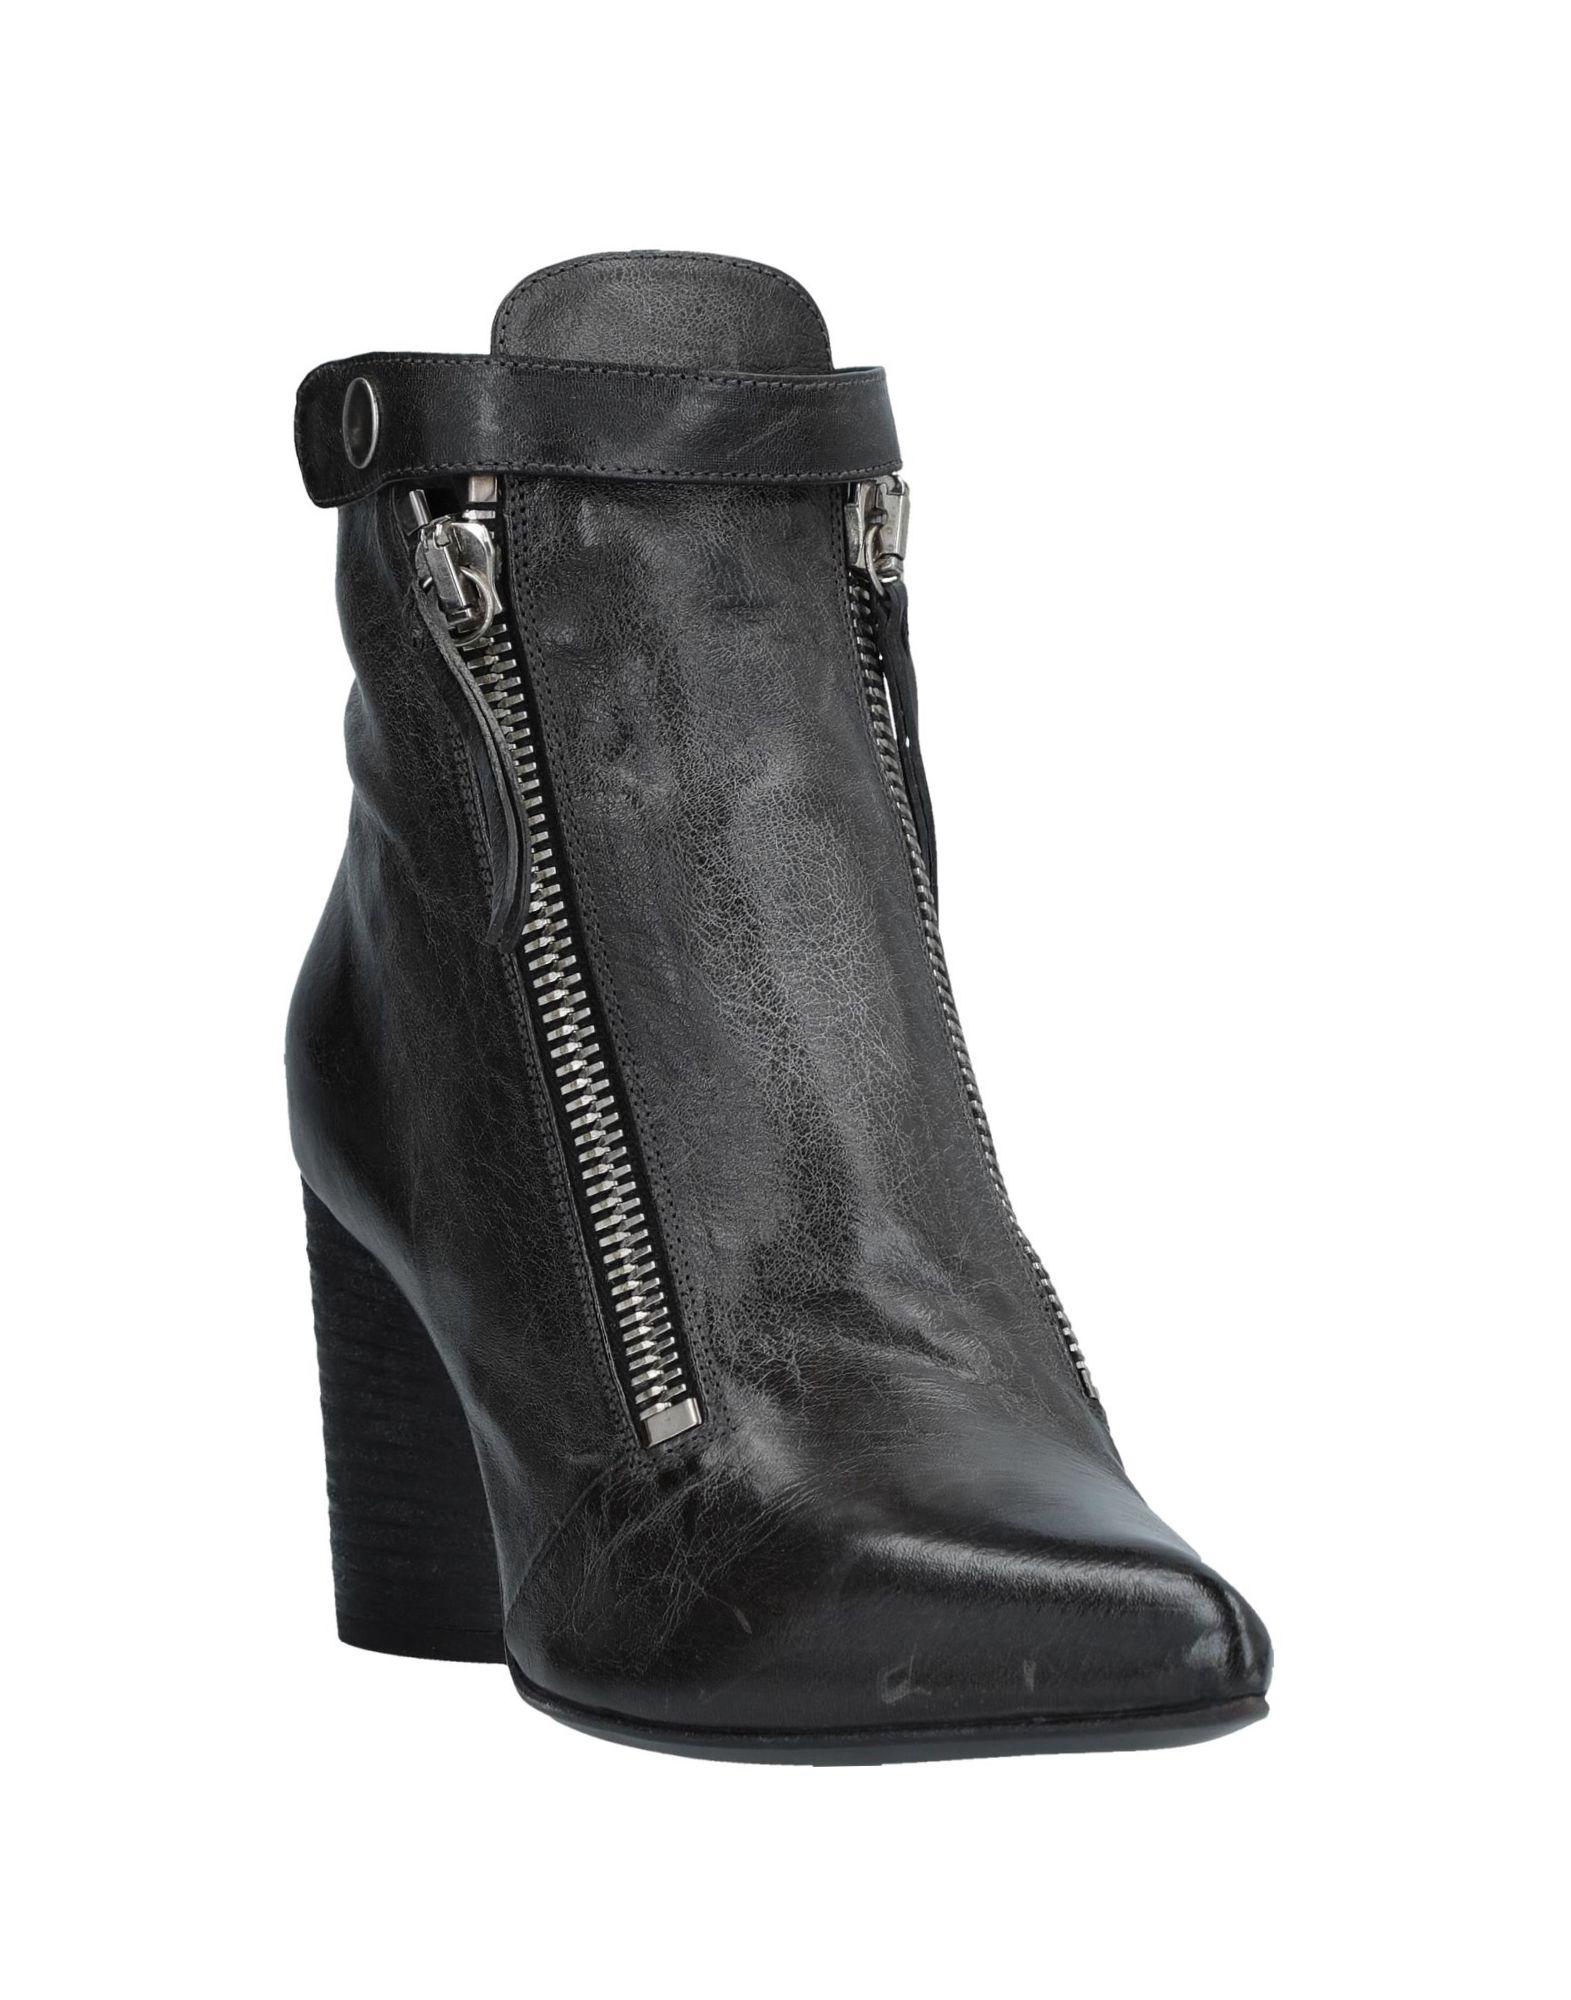 Rabatt Rabatt Rabatt Schuhe Premiata Stiefelette Damen 11529548XI e7f552